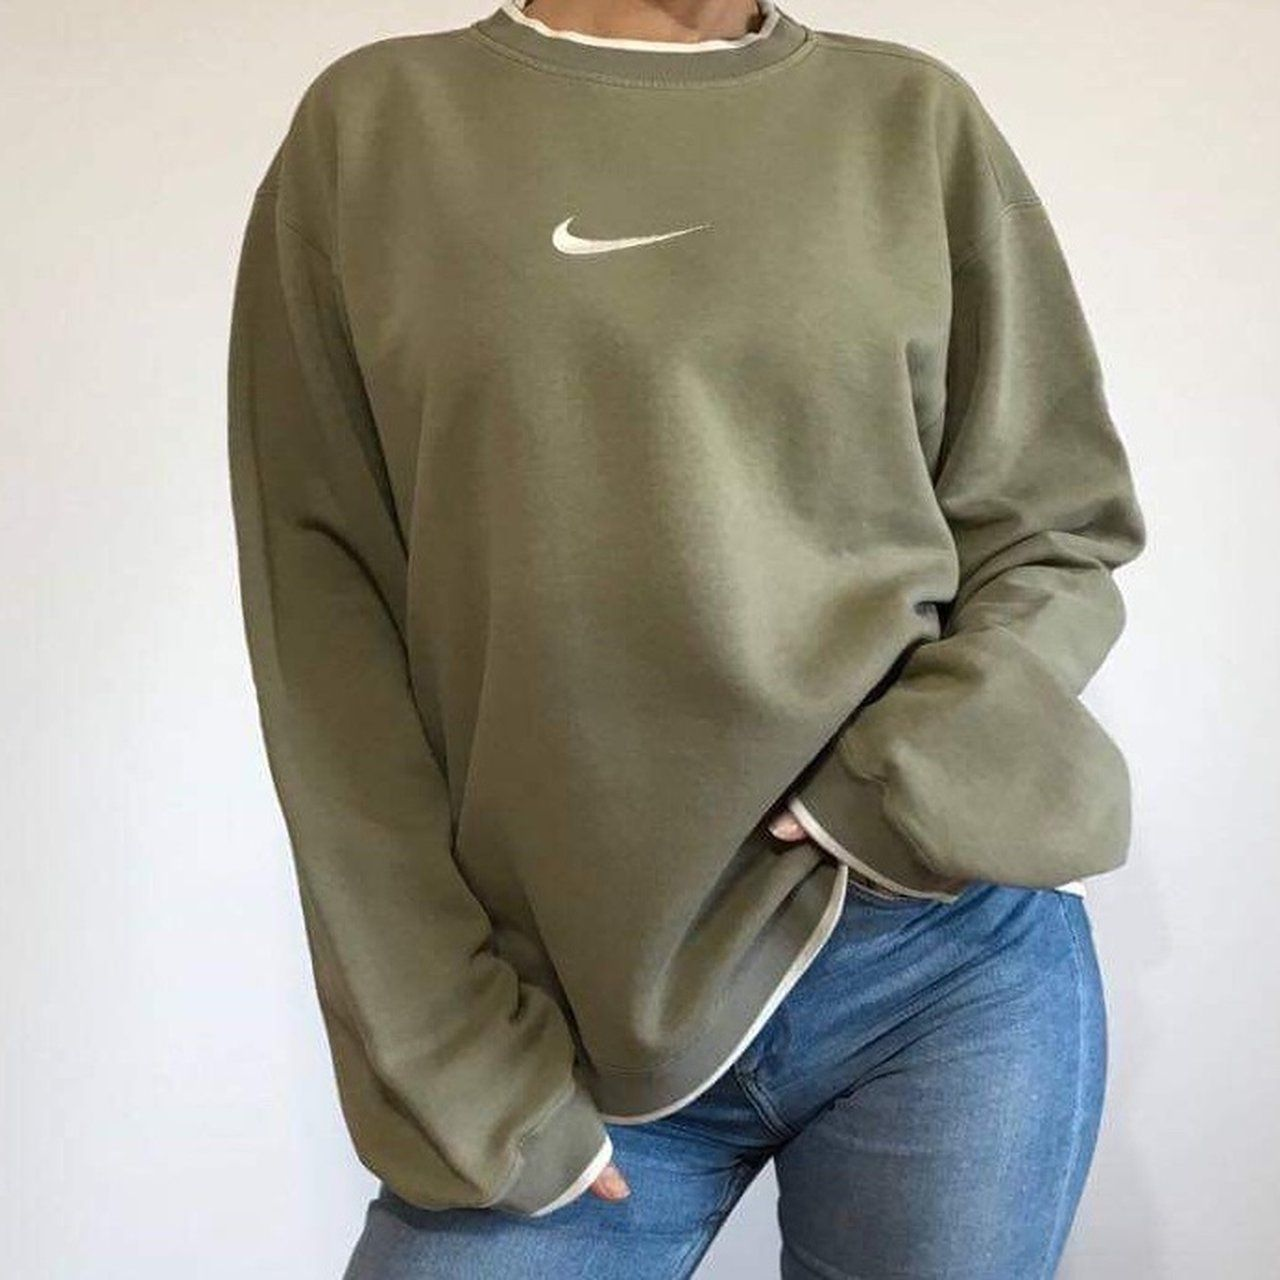 Unisex Nike Sweatshirt Megss Stone Size L Worn On Size Uk Depop Vintage Nike Sweatshirt Sweatshirts Vintage Sweatshirt [ 1280 x 1280 Pixel ]